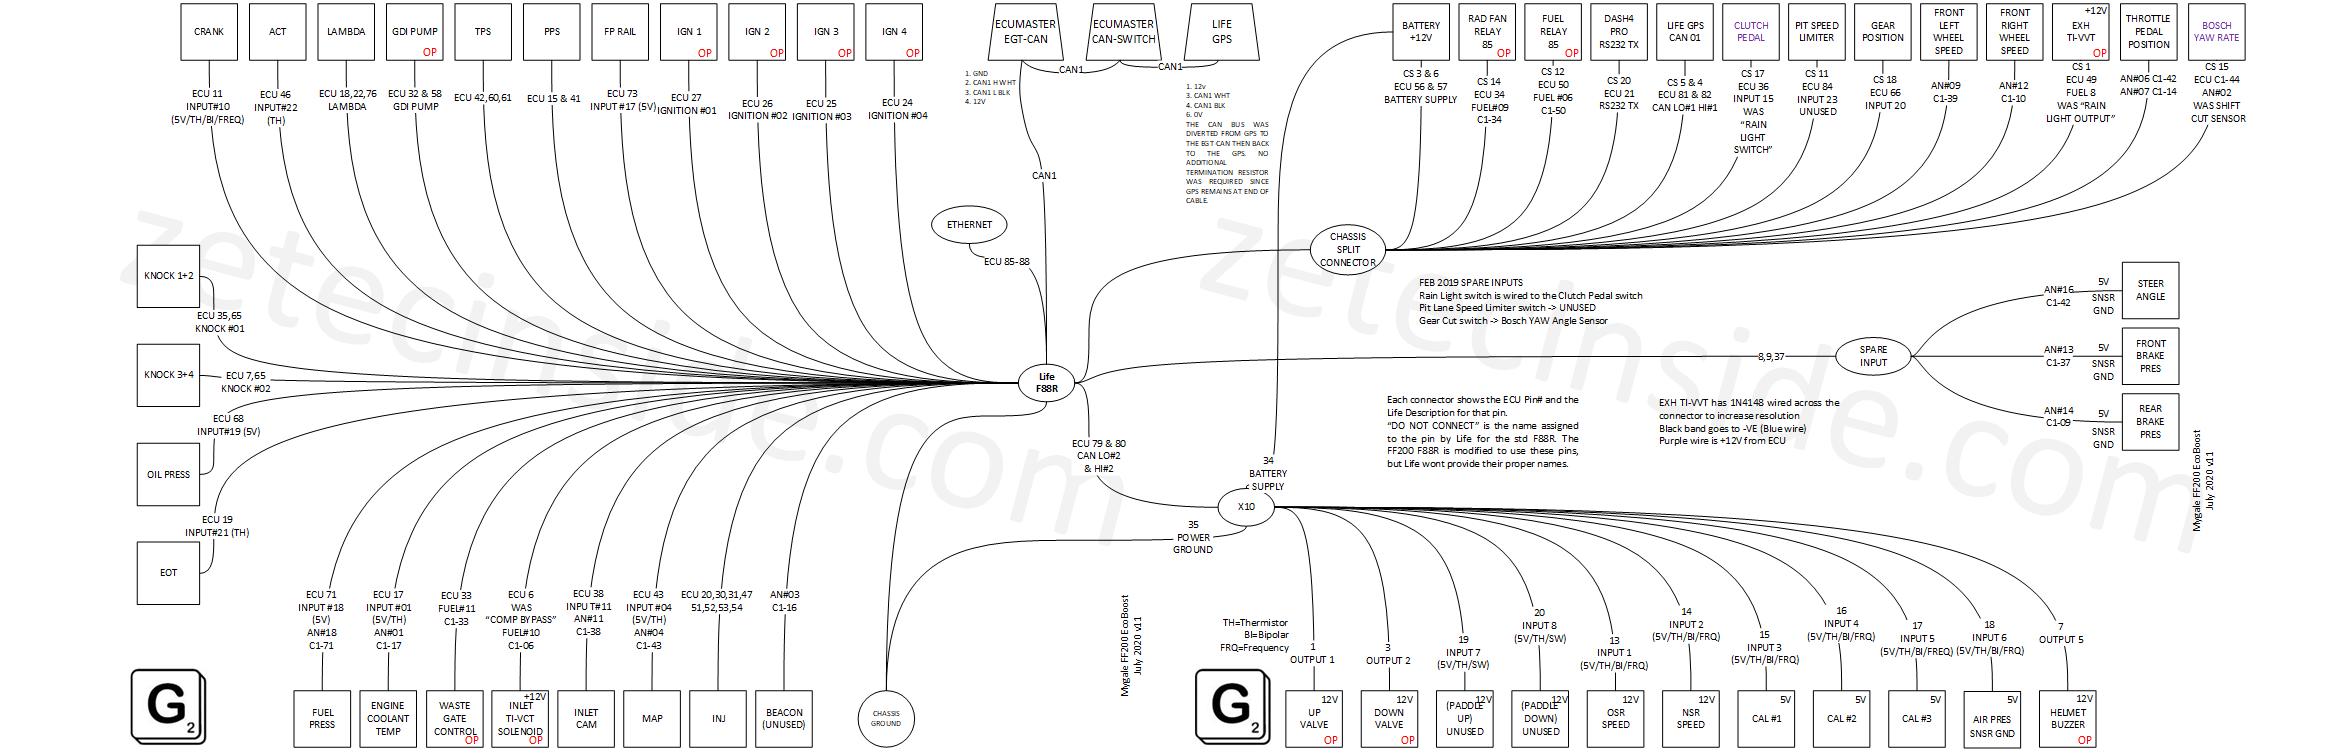 FF200VisioDiagram X Wiring Diagram on x10 automation, x10 software, x10 wireless camera internal schematic, x10 devices, x10 technologies, x10 diagrams, x10 modules, x10 remote schematic,